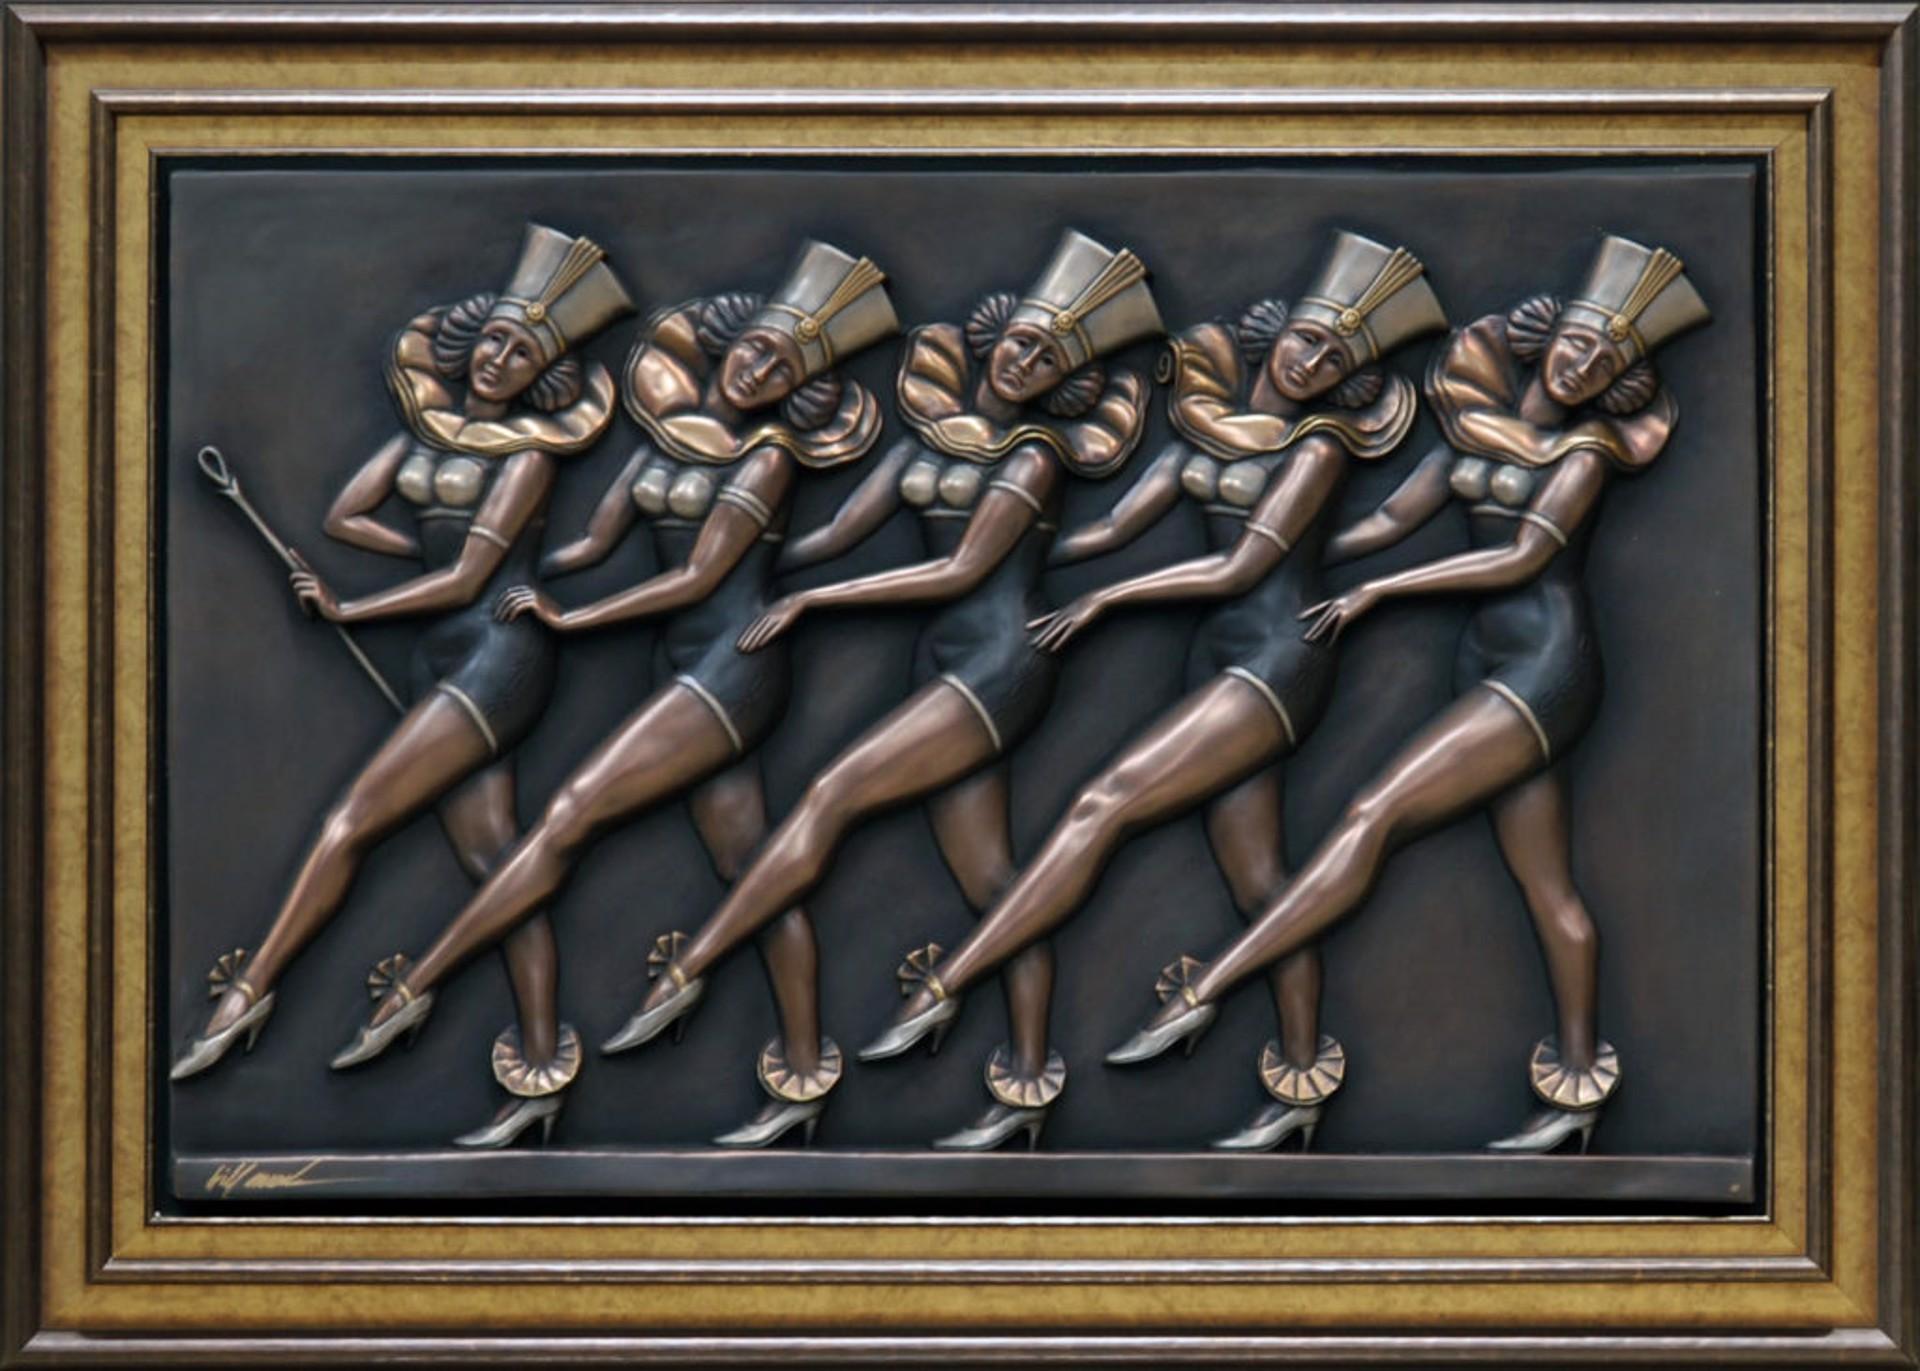 Endless Dance by Bill Mack